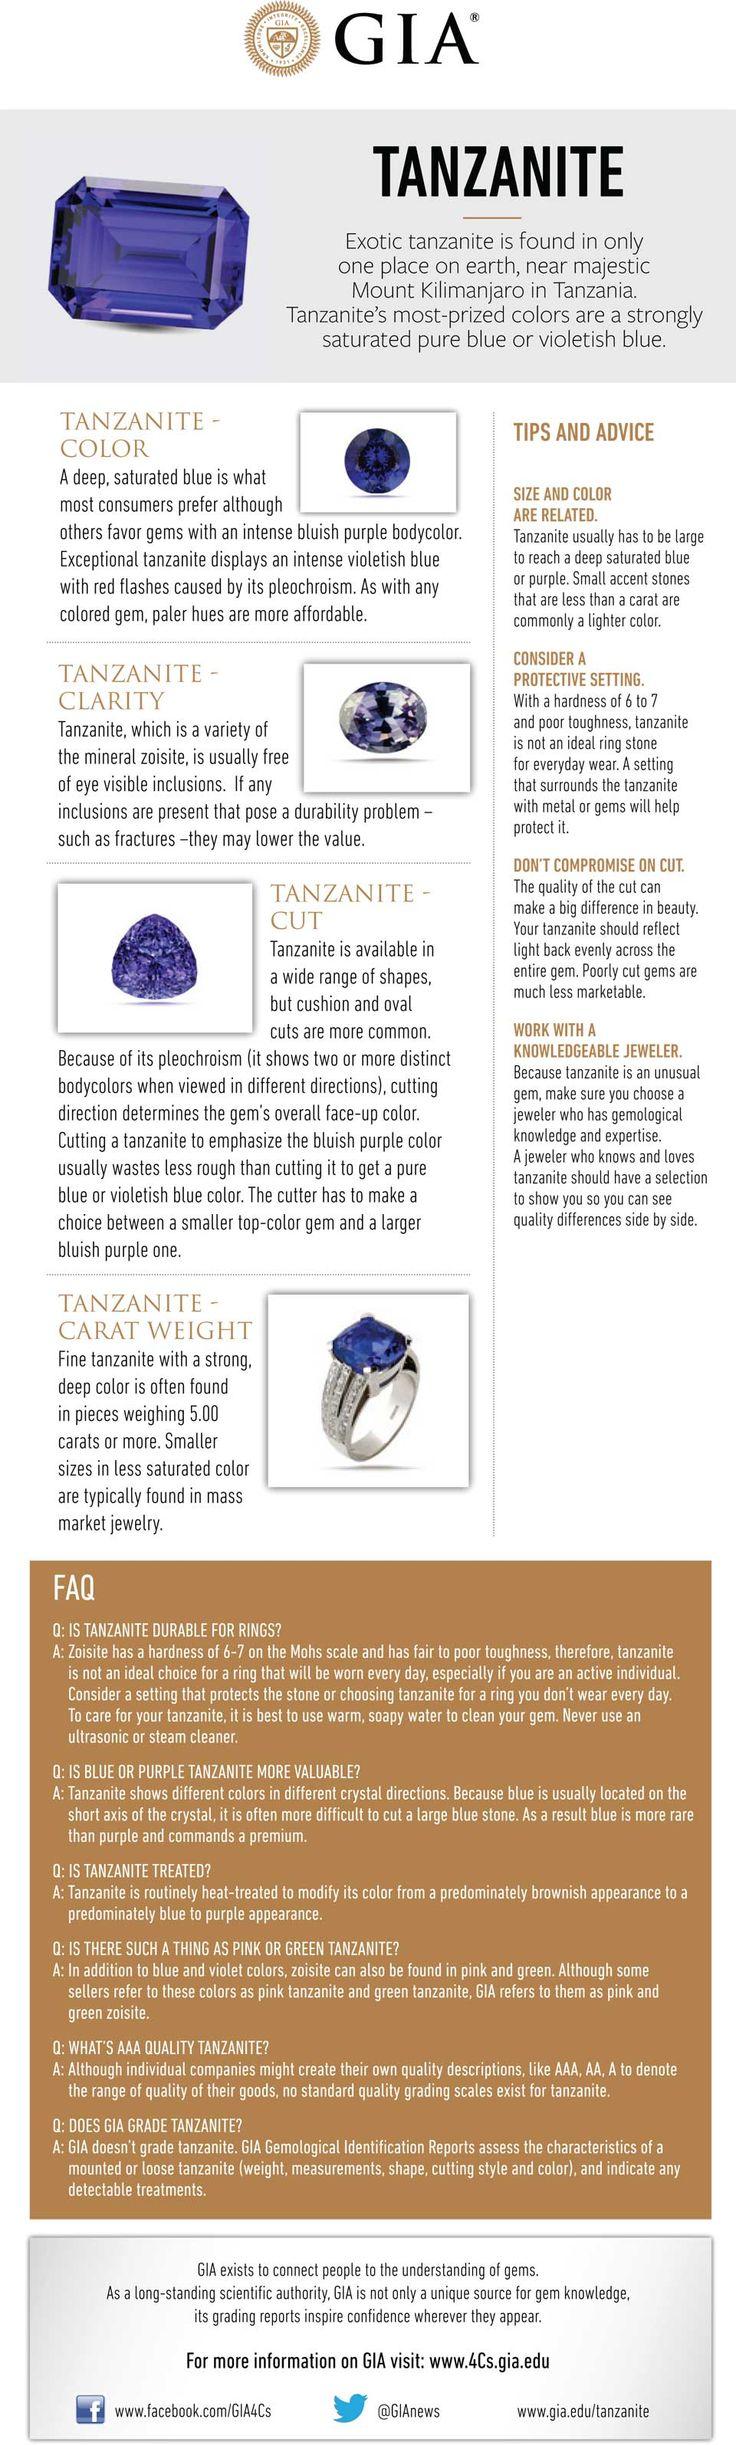 Tanzanite buying guide. GIA (021815)